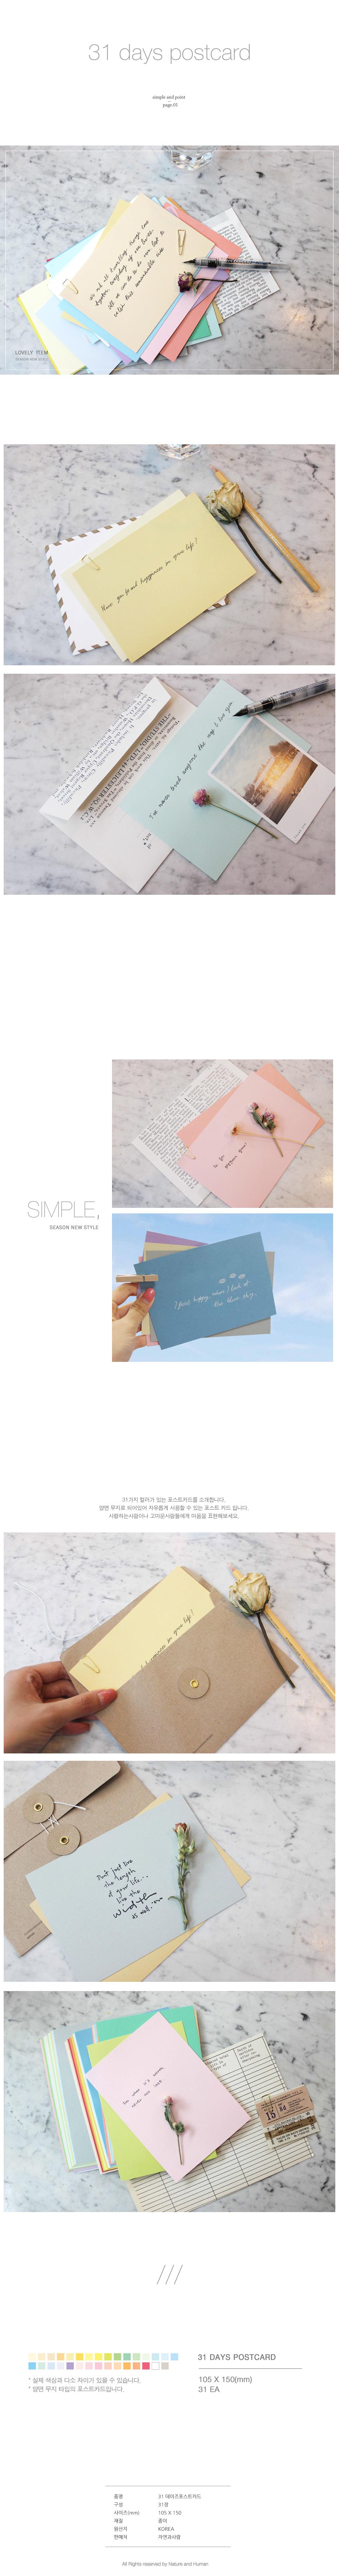 31 days postcard - 자연과사람, 5,800원, 엽서, 심플